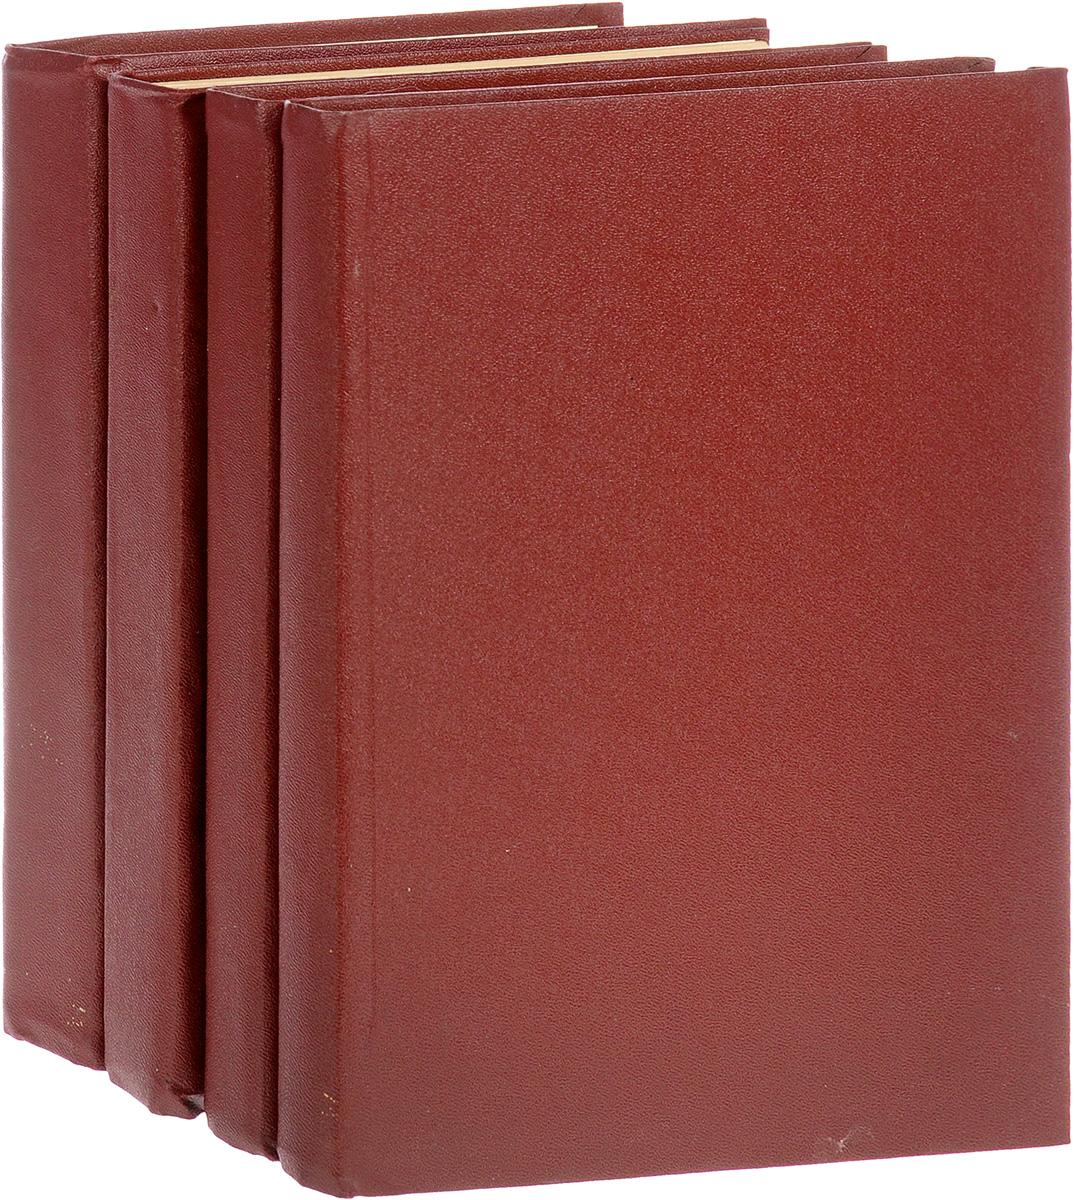 Роман-газета. № 1-18, 20-24 (1982). Конволют (комплект из 4 книг)